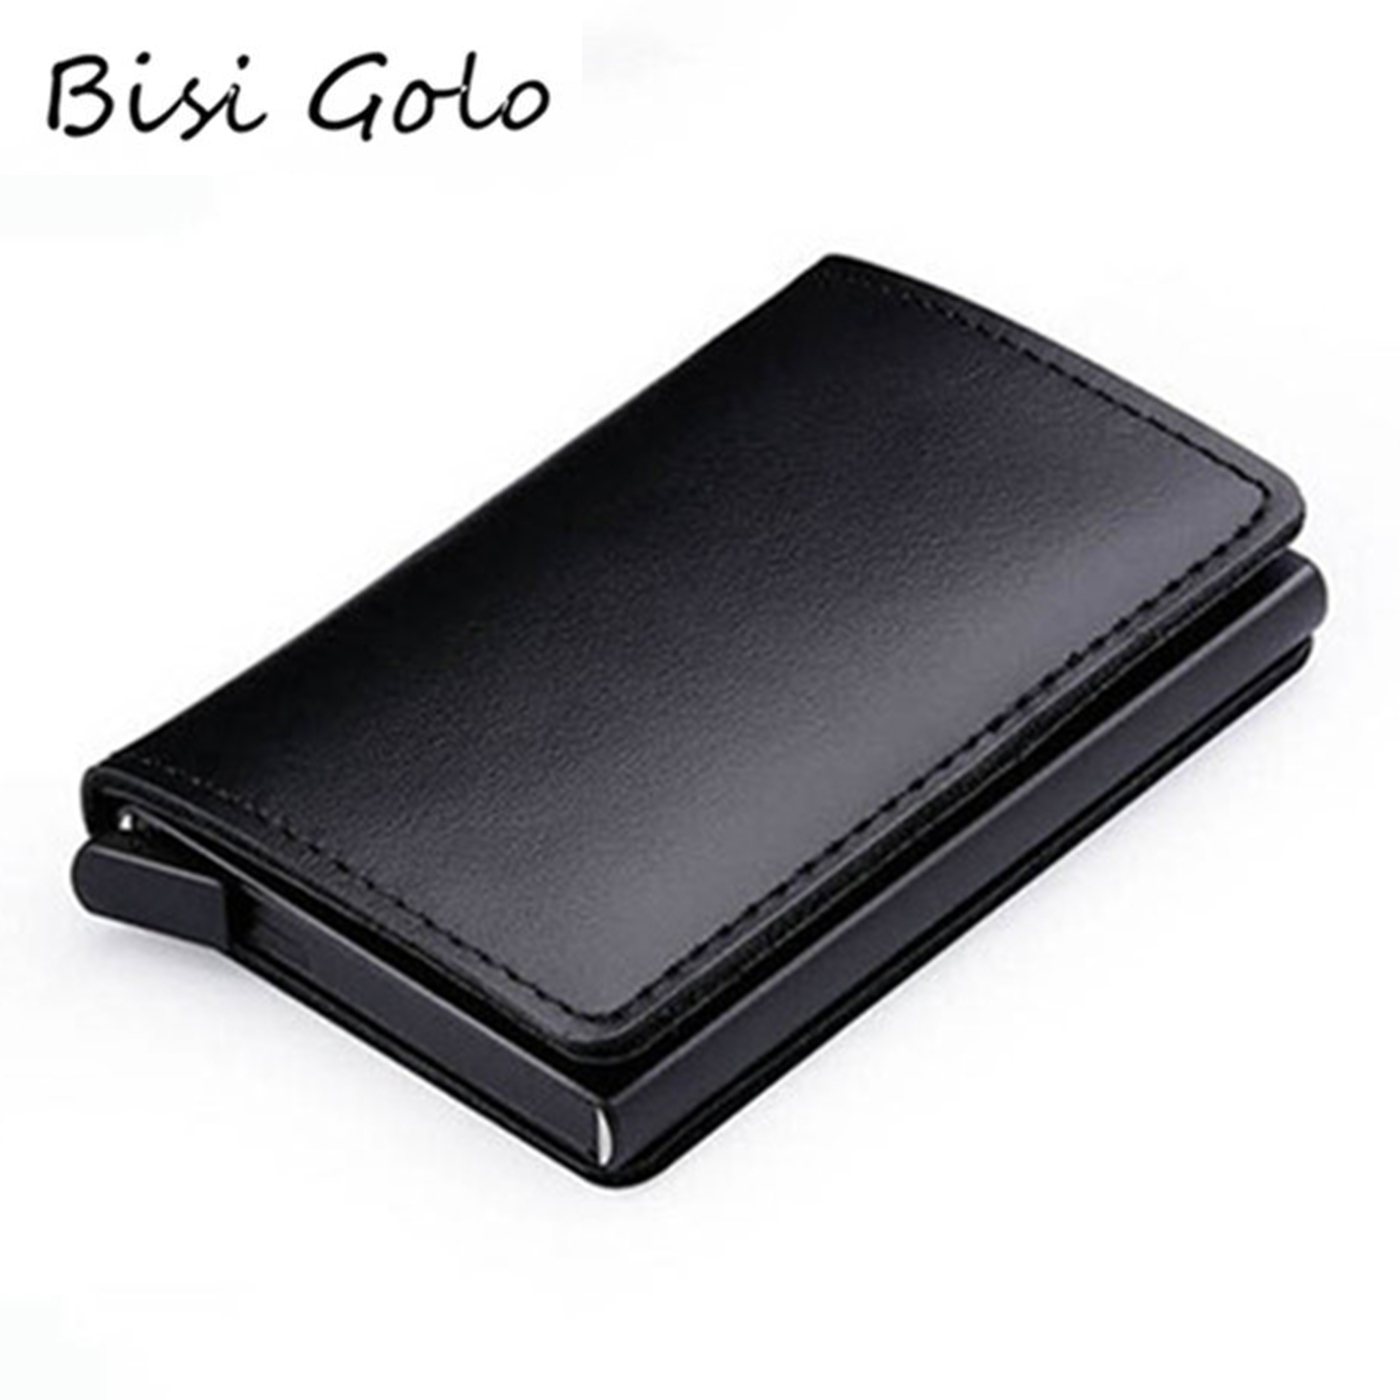 BISI GORO New Genuine Leather Wallet Slim Business Card Holder RFID Blocking Mini Purse Vintage Antitheft Organizer Card Wallet